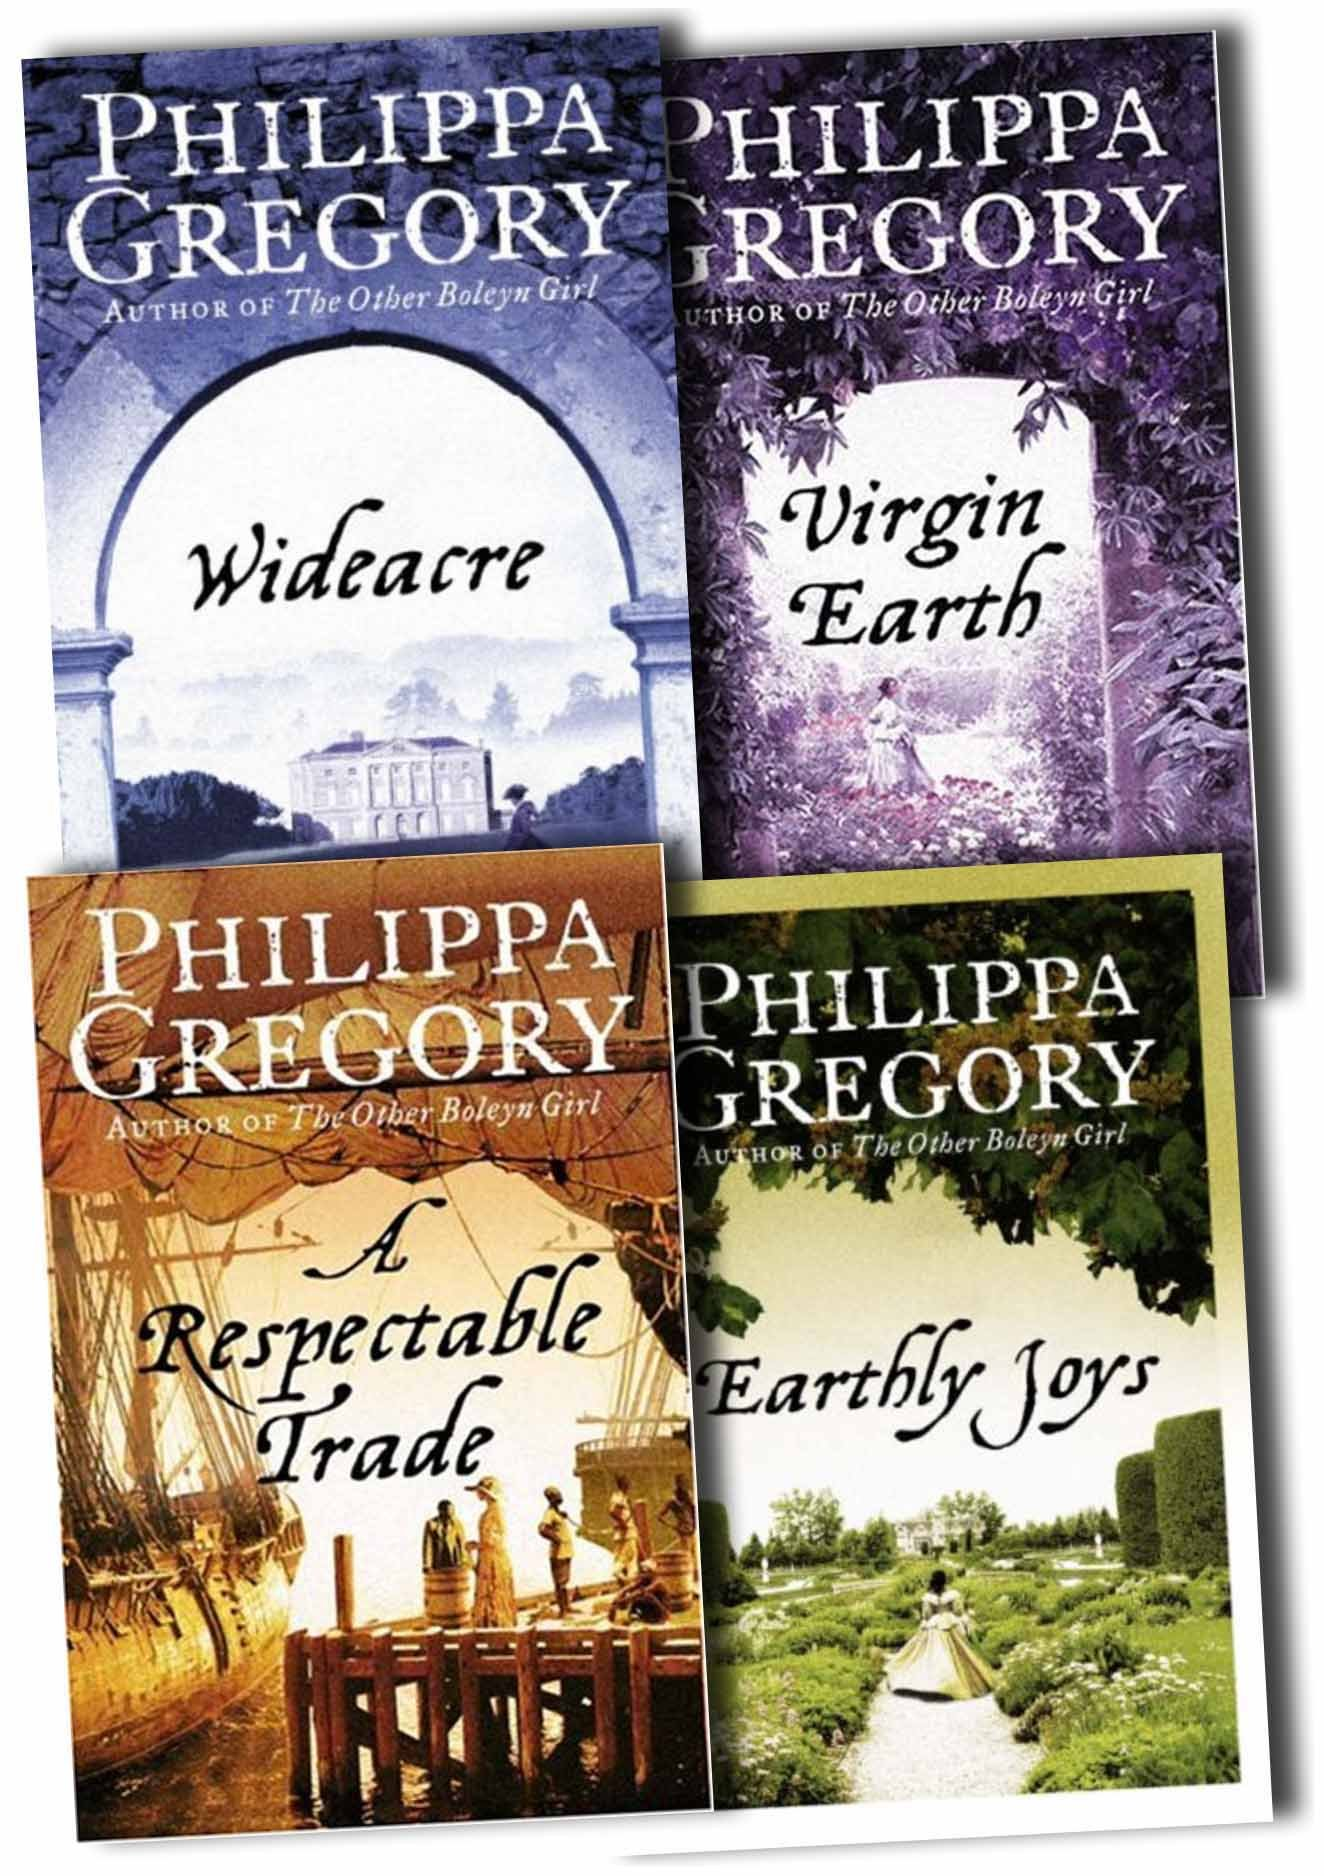 a respectable trade gregory philippa